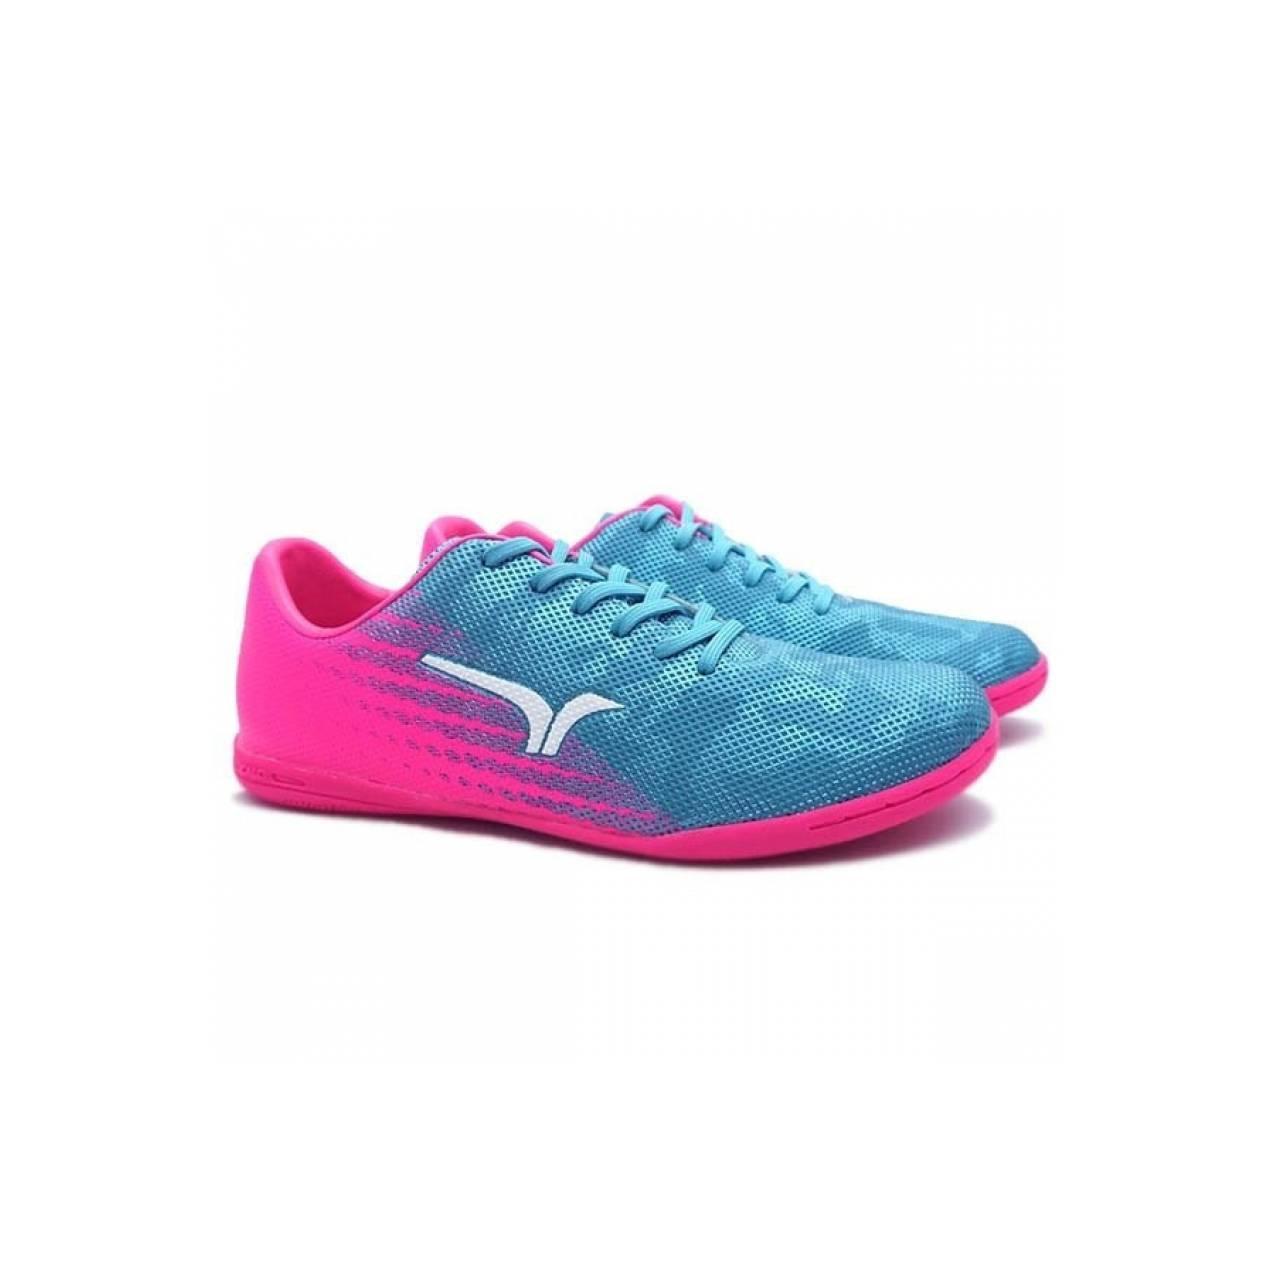 Sepatu Futsal Calci Ceranno ID Blue Fuchsia